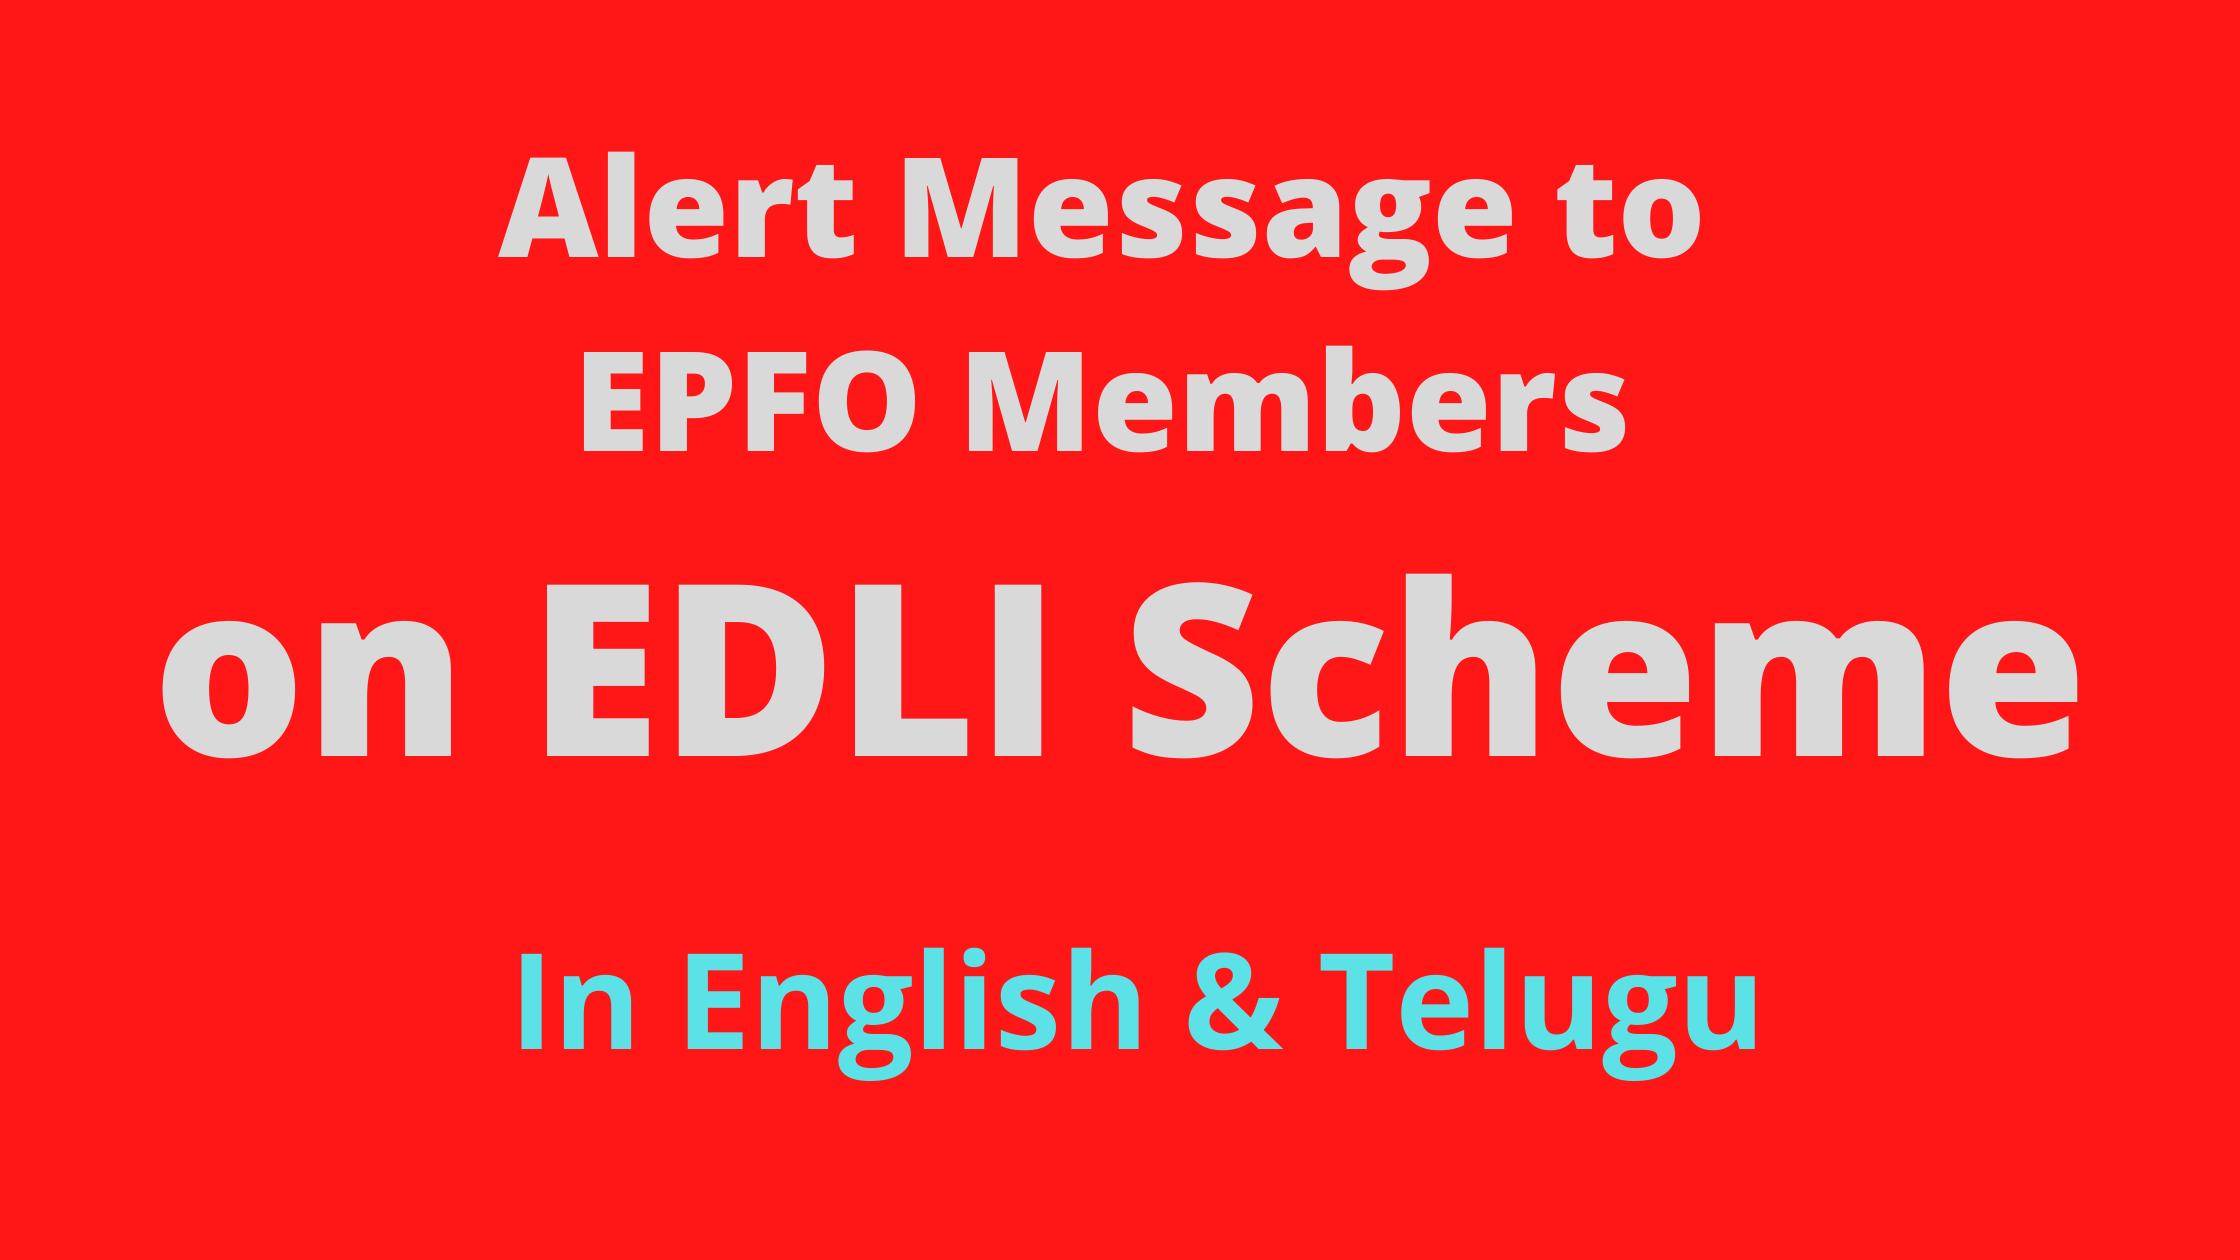 Alert Message to EPFO Members on EDLI Scheme